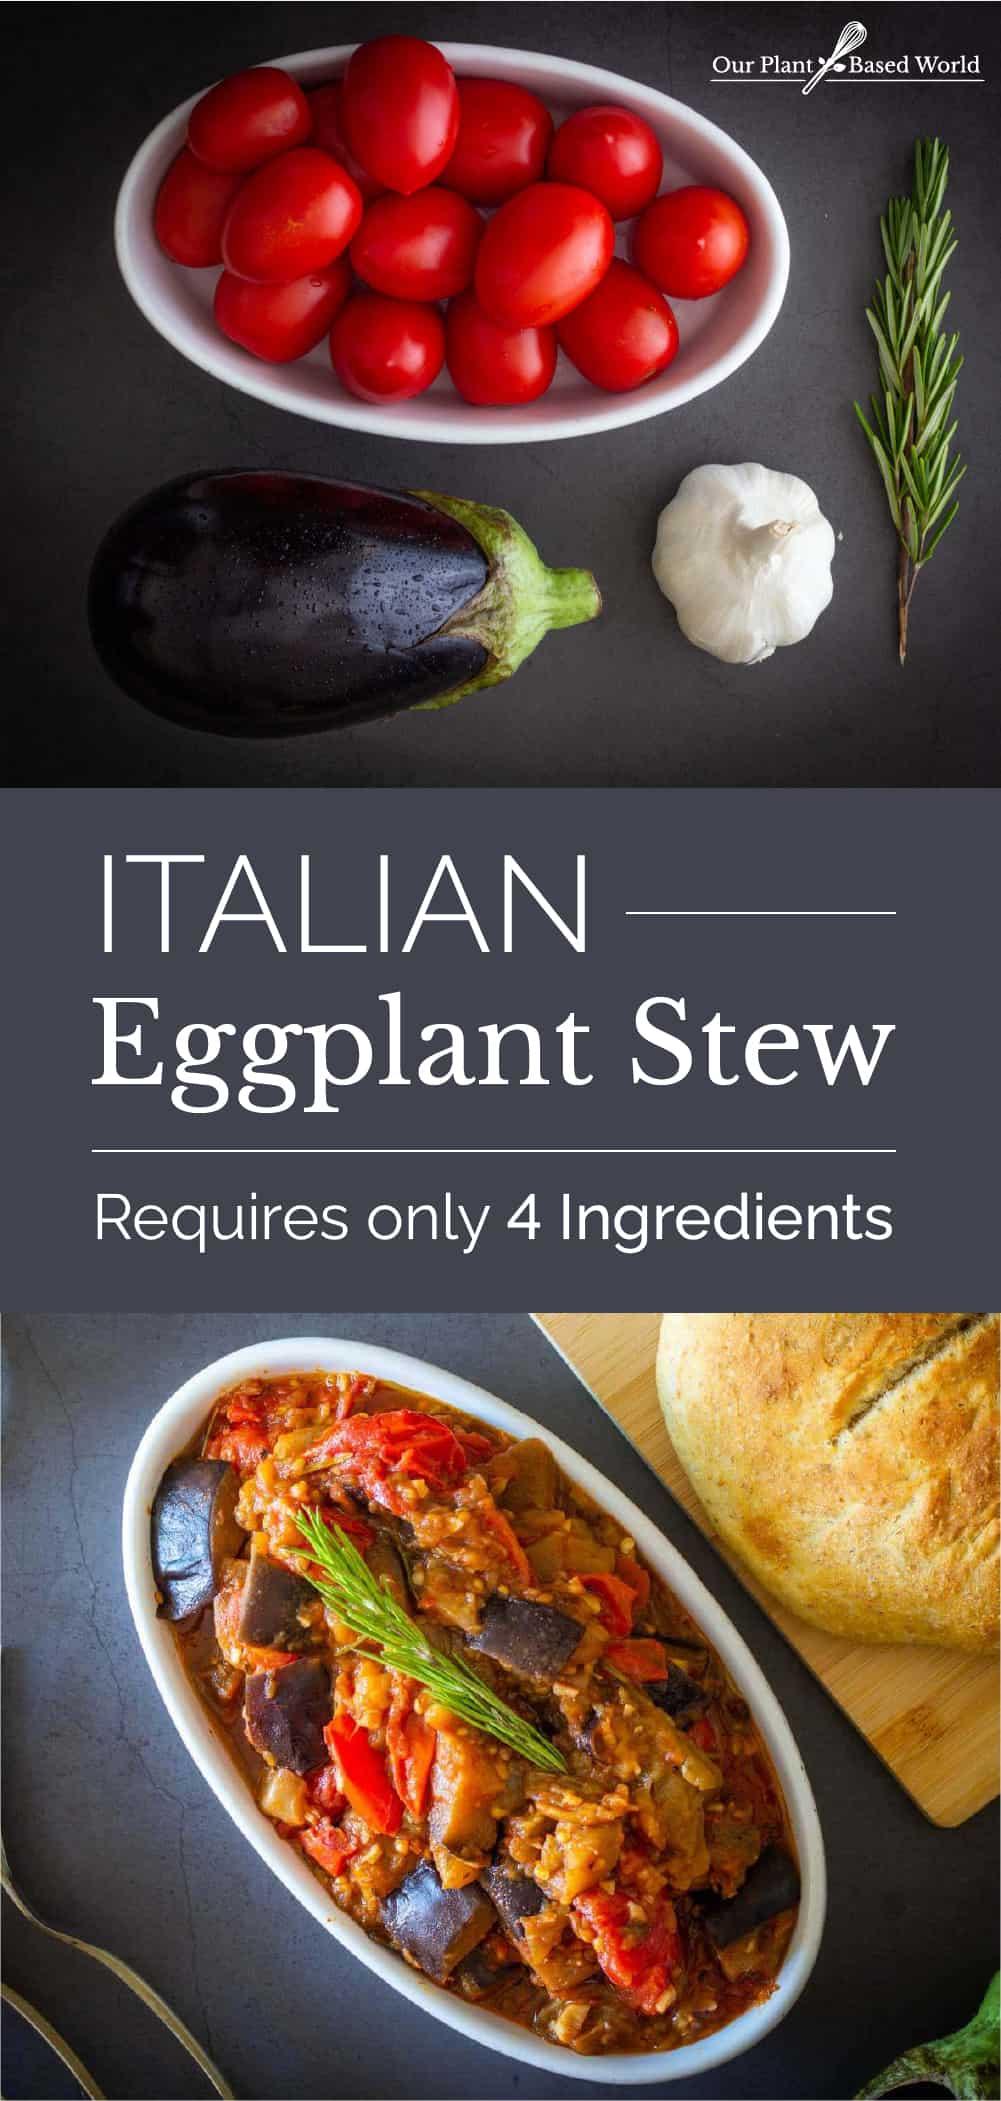 Italian Eggplant Stew